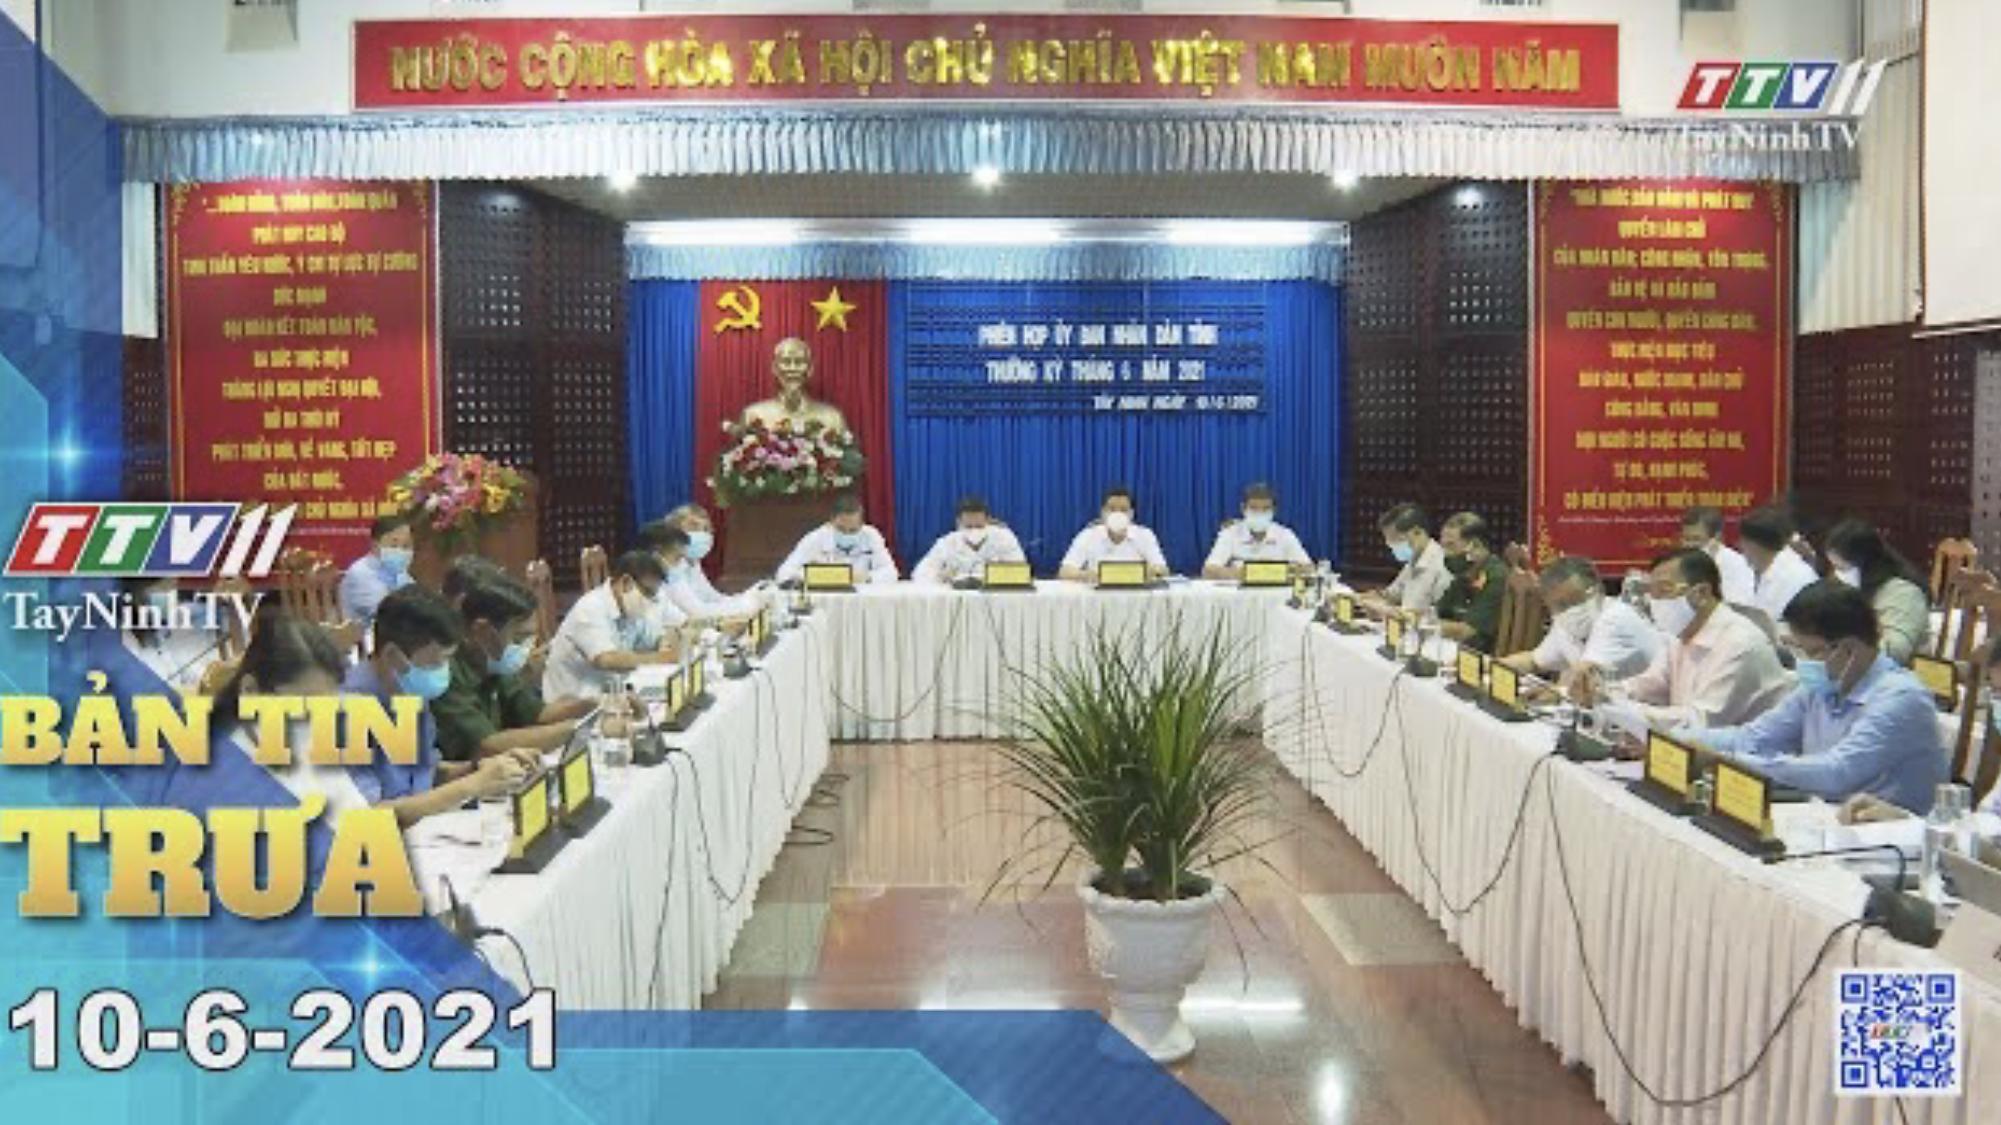 Bản tin trưa 10-6-2021 | Tin tức hôm nay | TayNinhTV